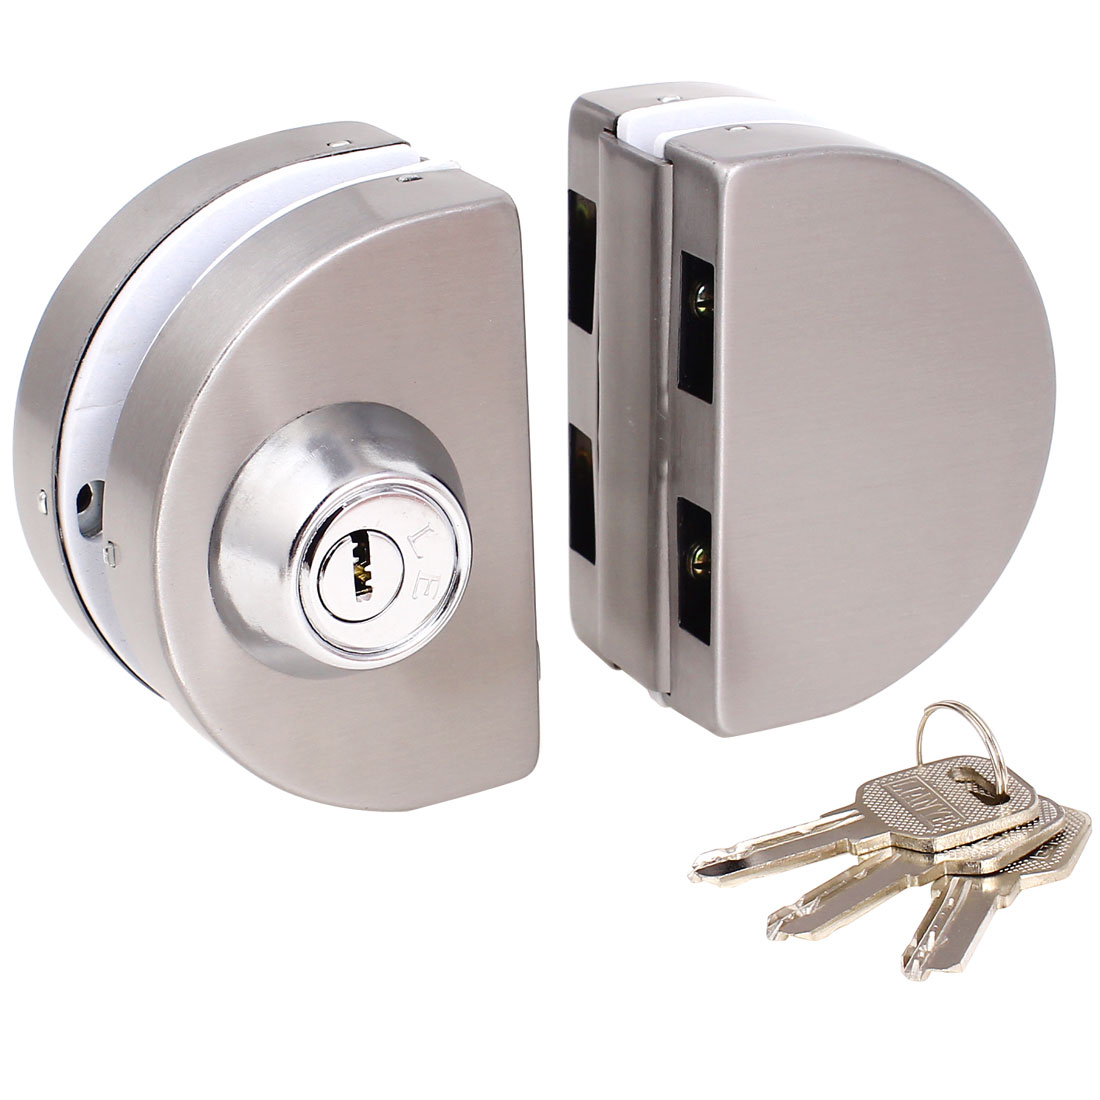 Entry Gate 10-12mm Glass Swing Push Sliding Door Lock w Keys